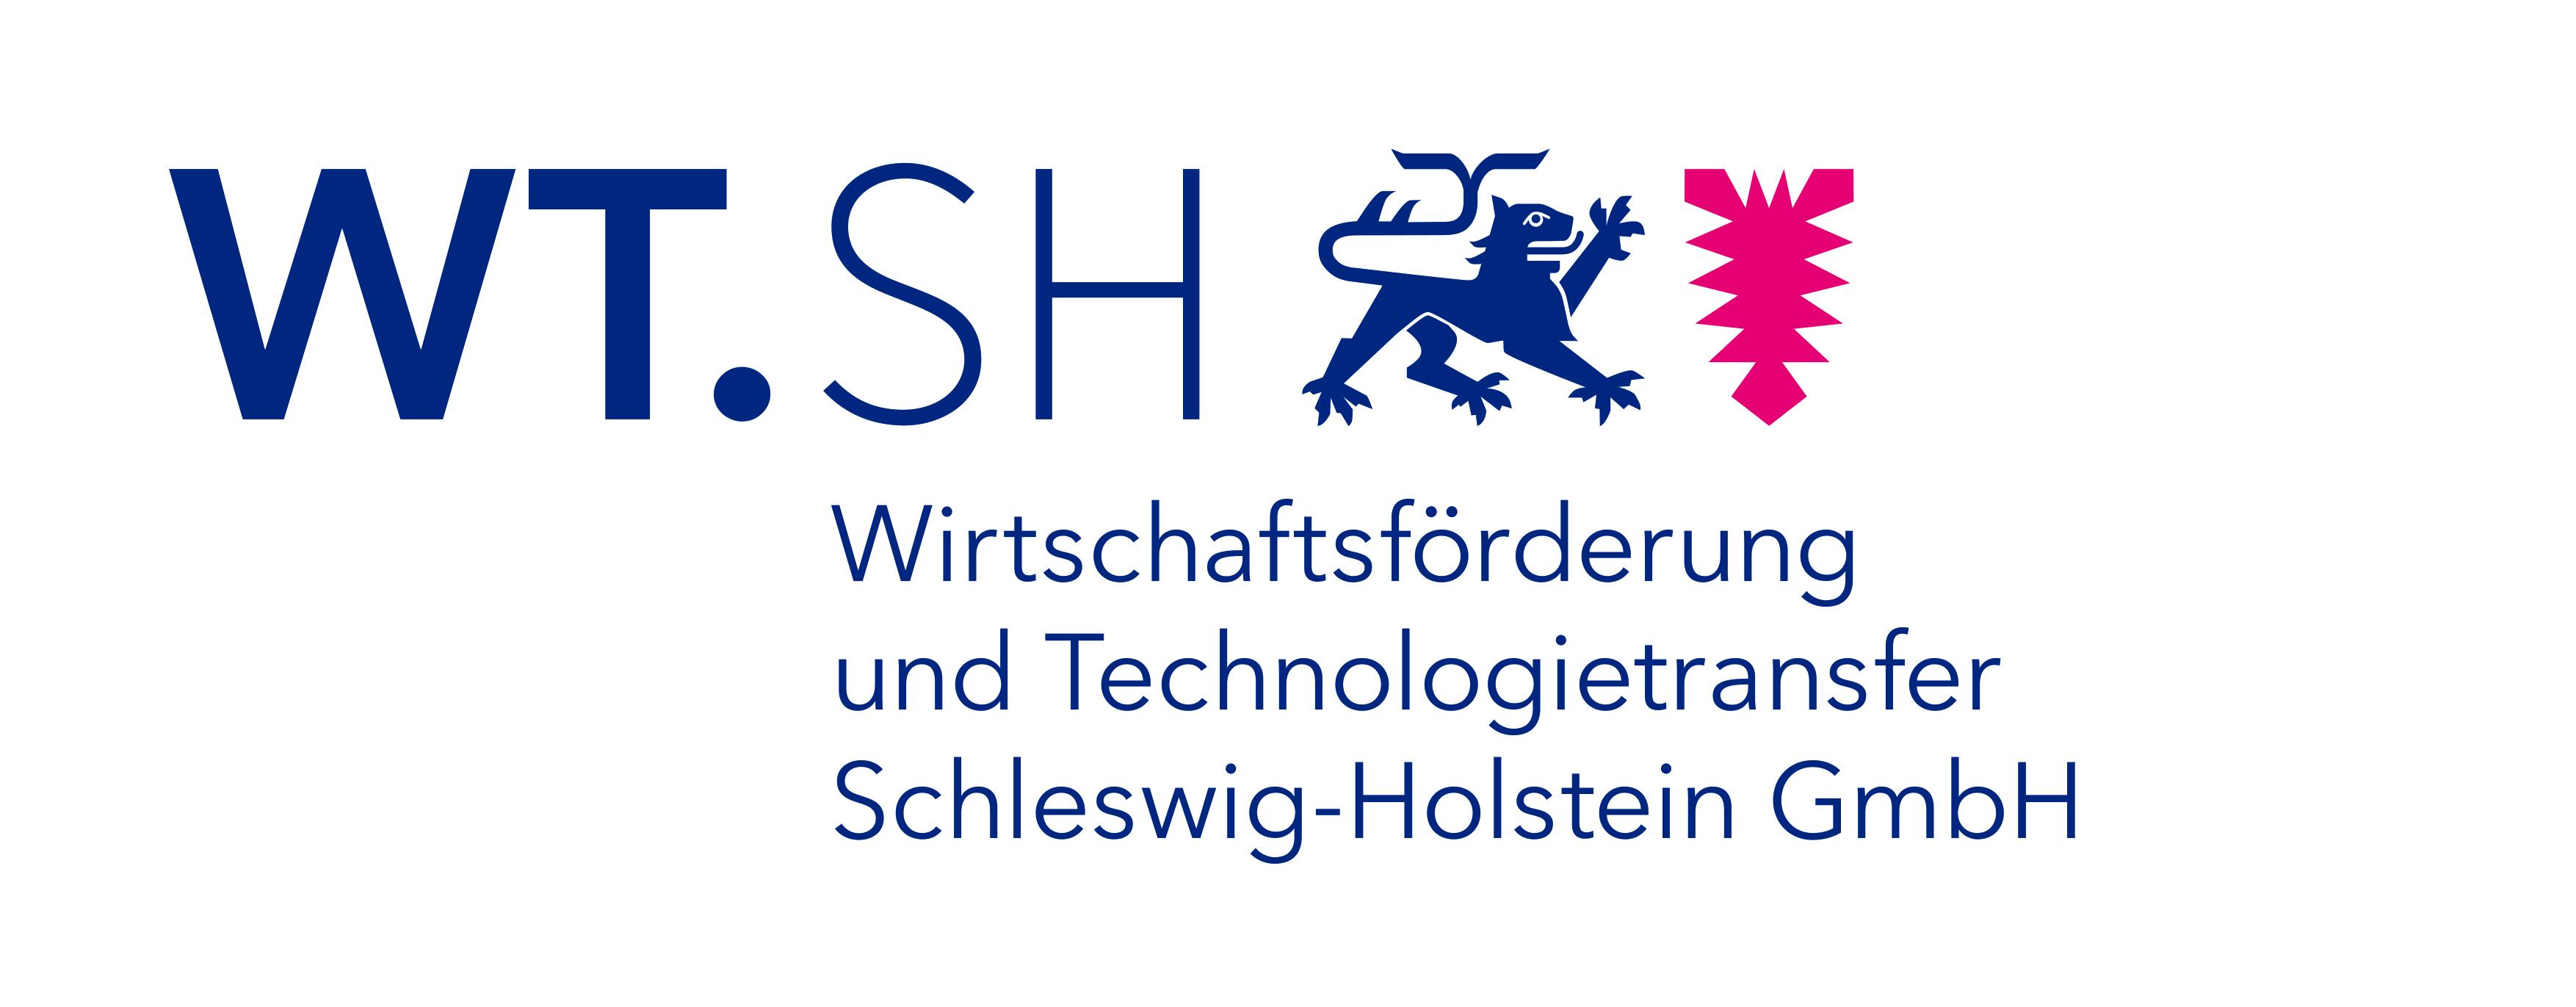 WTSH_Logo_DE_normal_Rot-Blau_CMYK